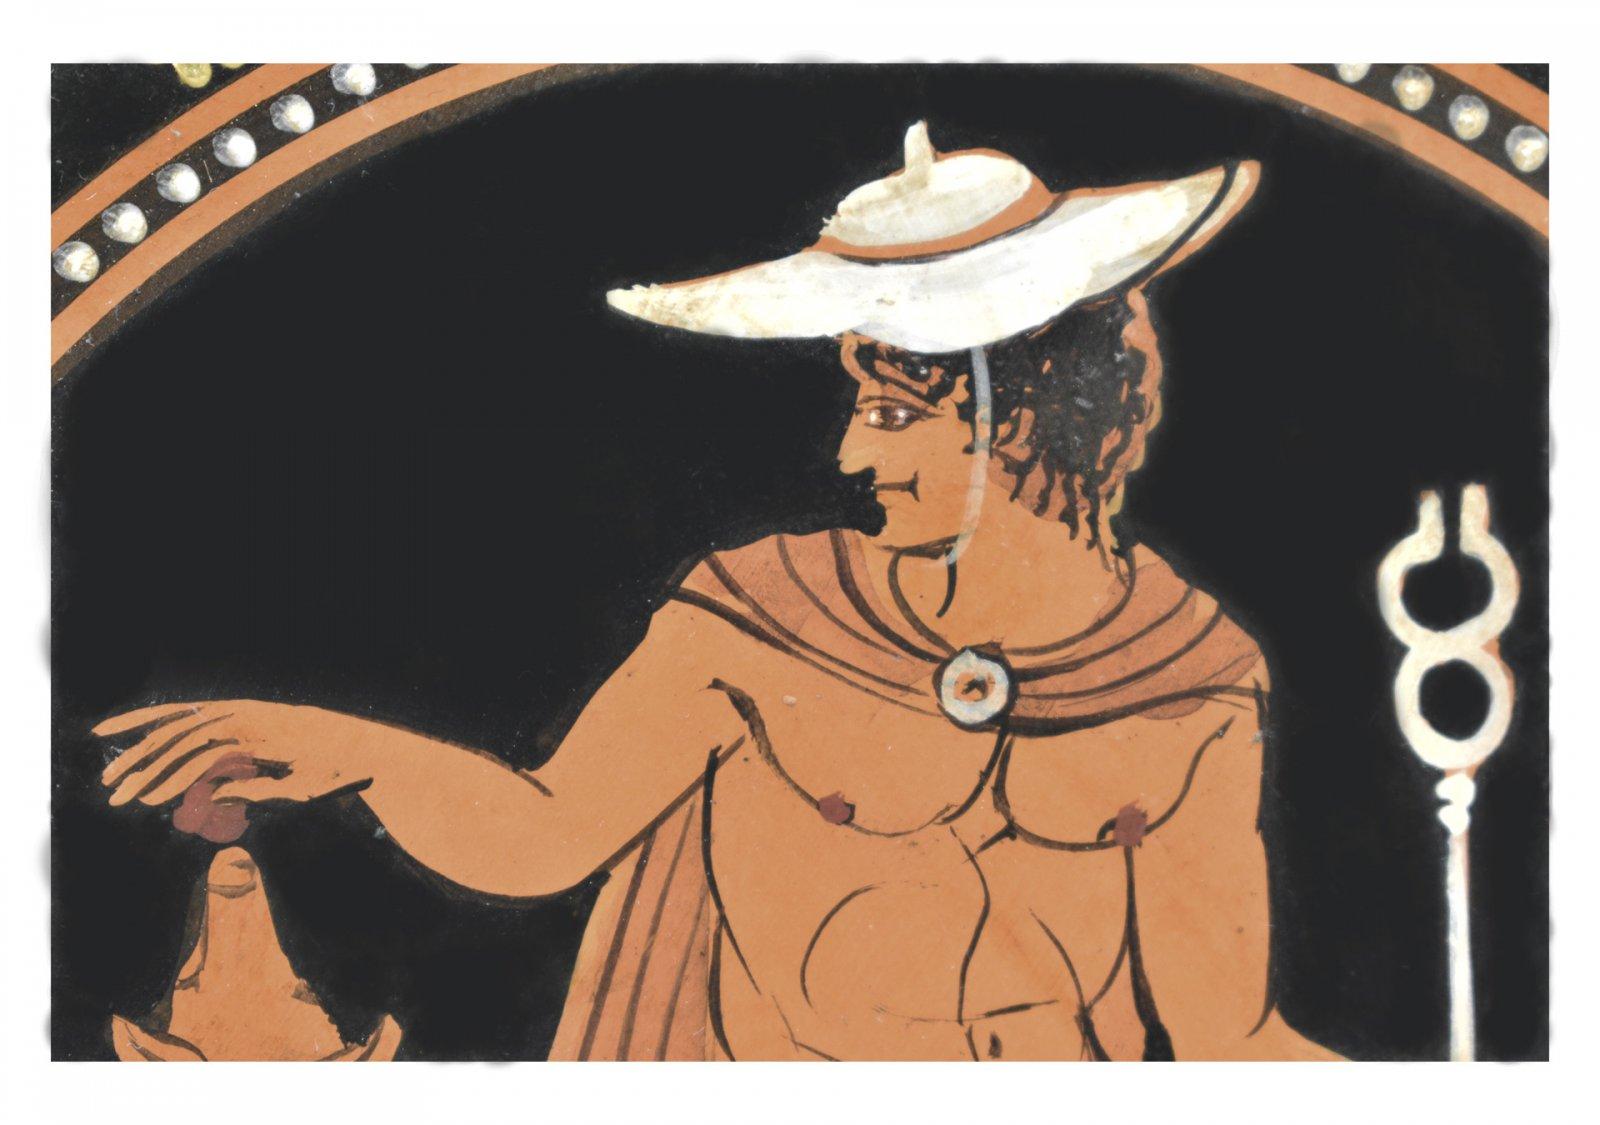 Greek ceramic plate depicting Hermes